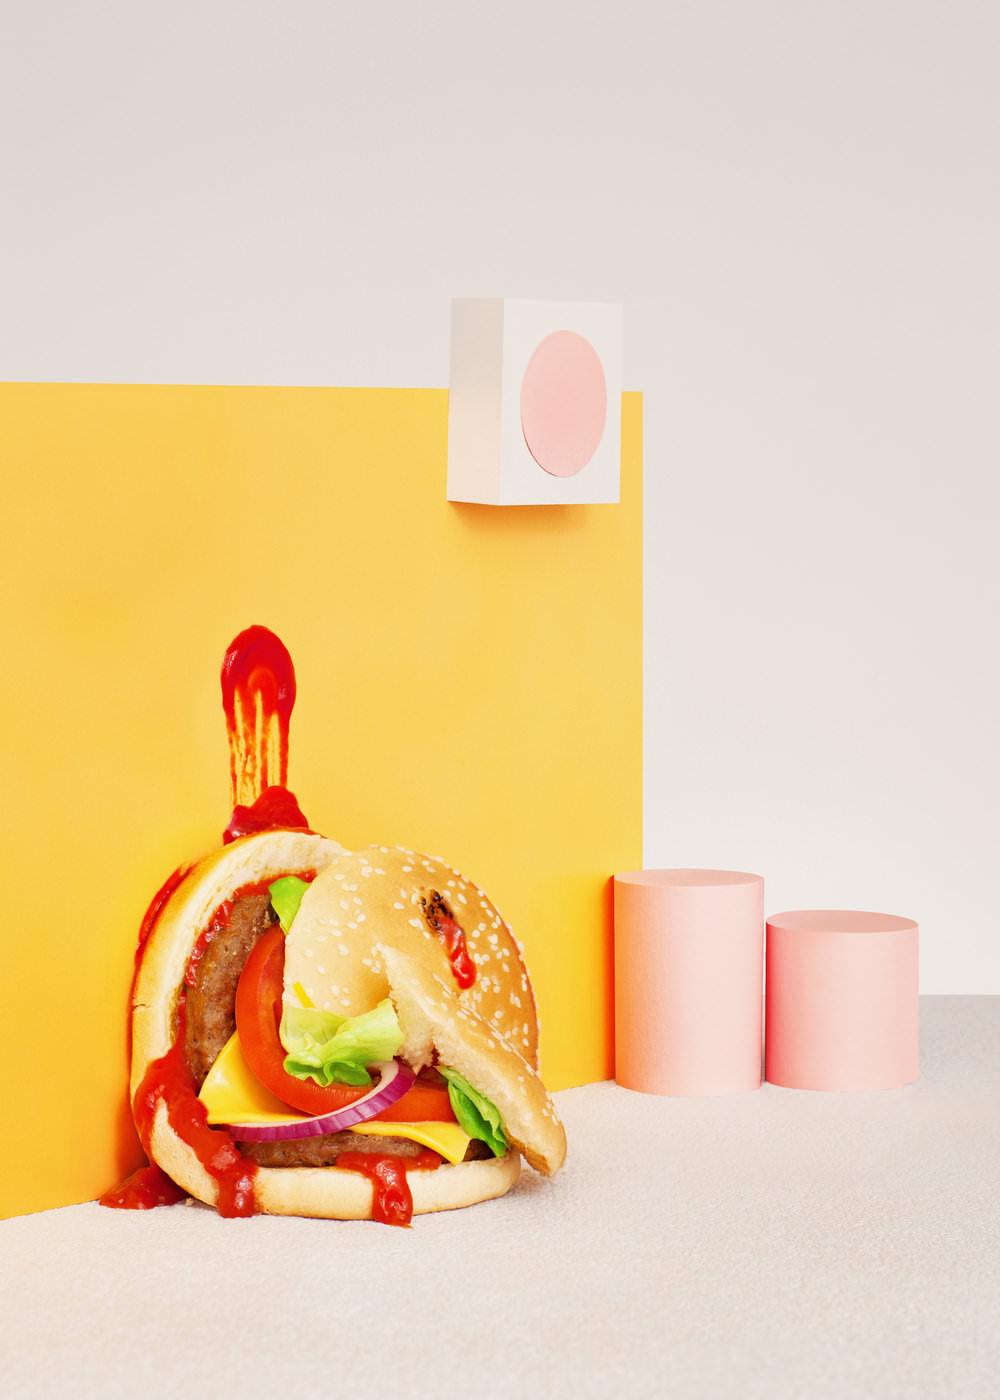 Ilka & Frank, Tragic Murder Of A Hamburger